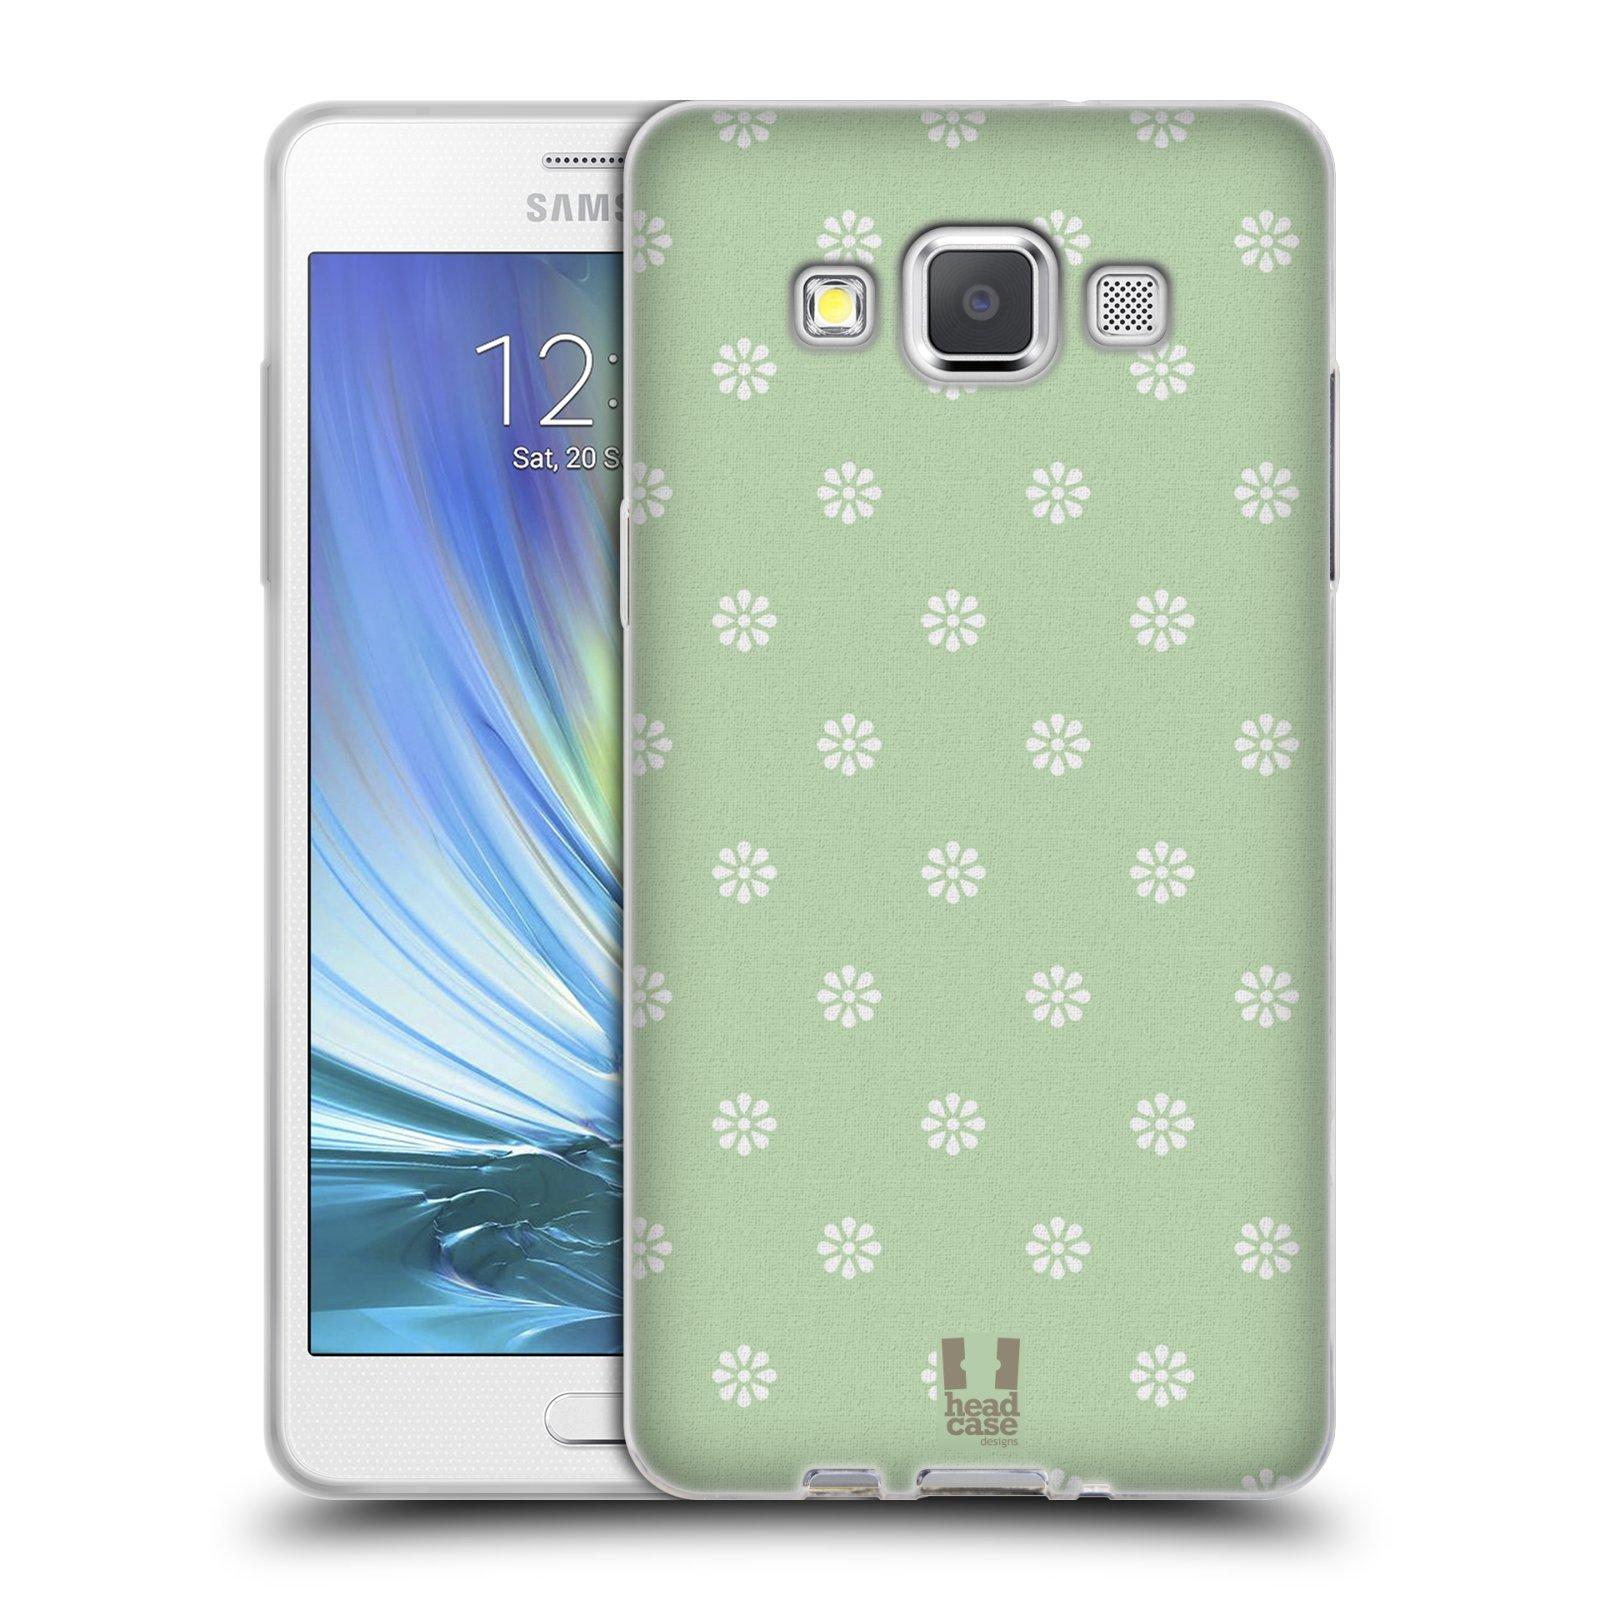 HEAD CASE silikonový obal na mobil Samsung Galaxy A5 Francouzský motiv venkov malé květinky zelené pozadí